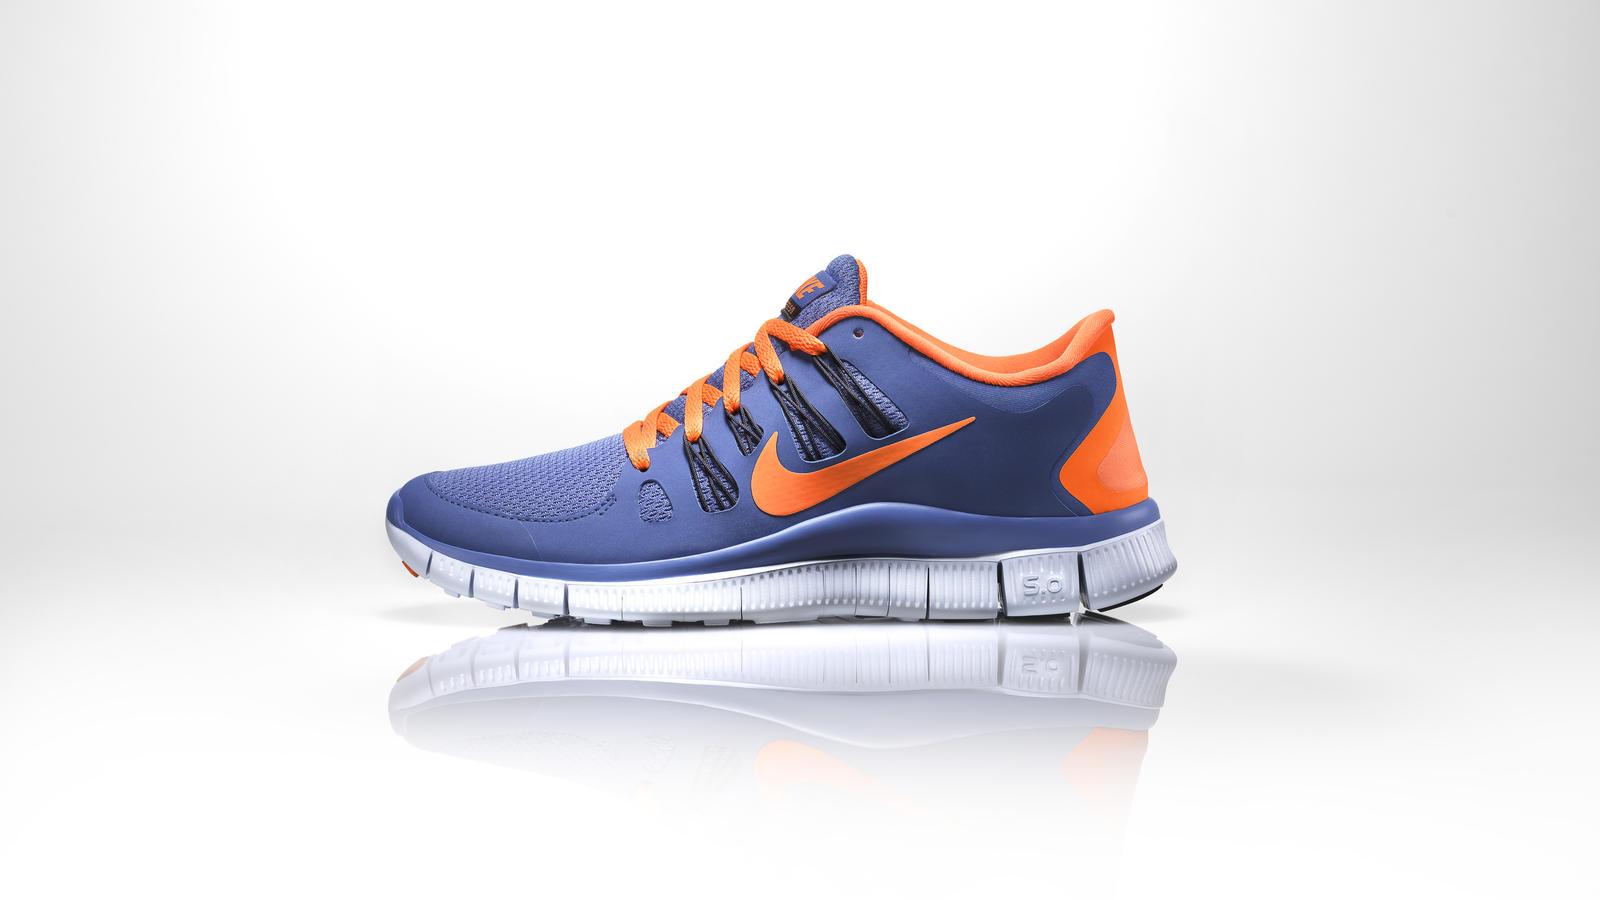 Nike Free 5.0+ (Women's)